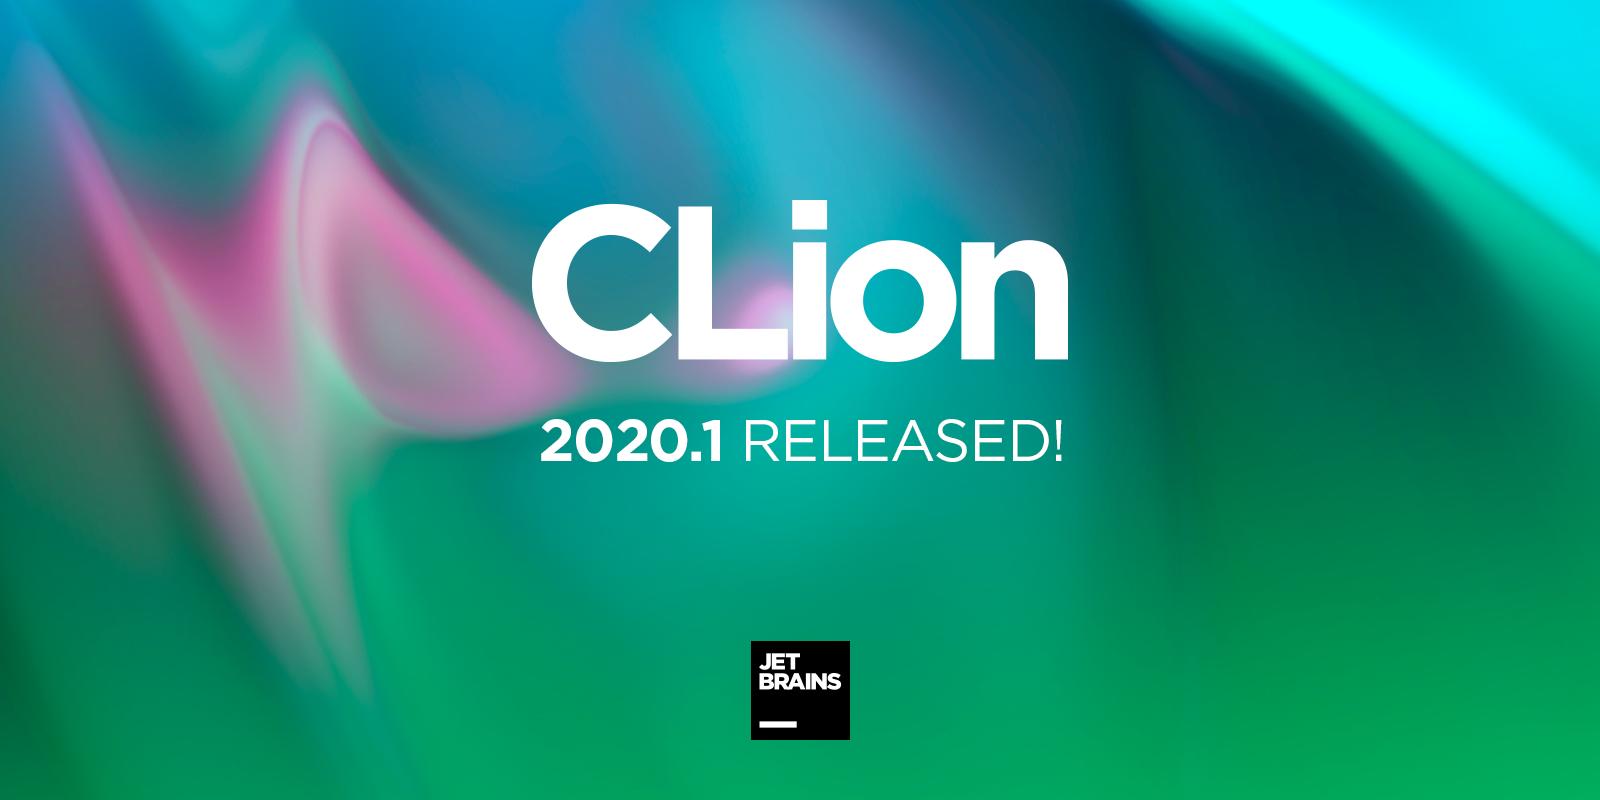 CLion 2020.1 release